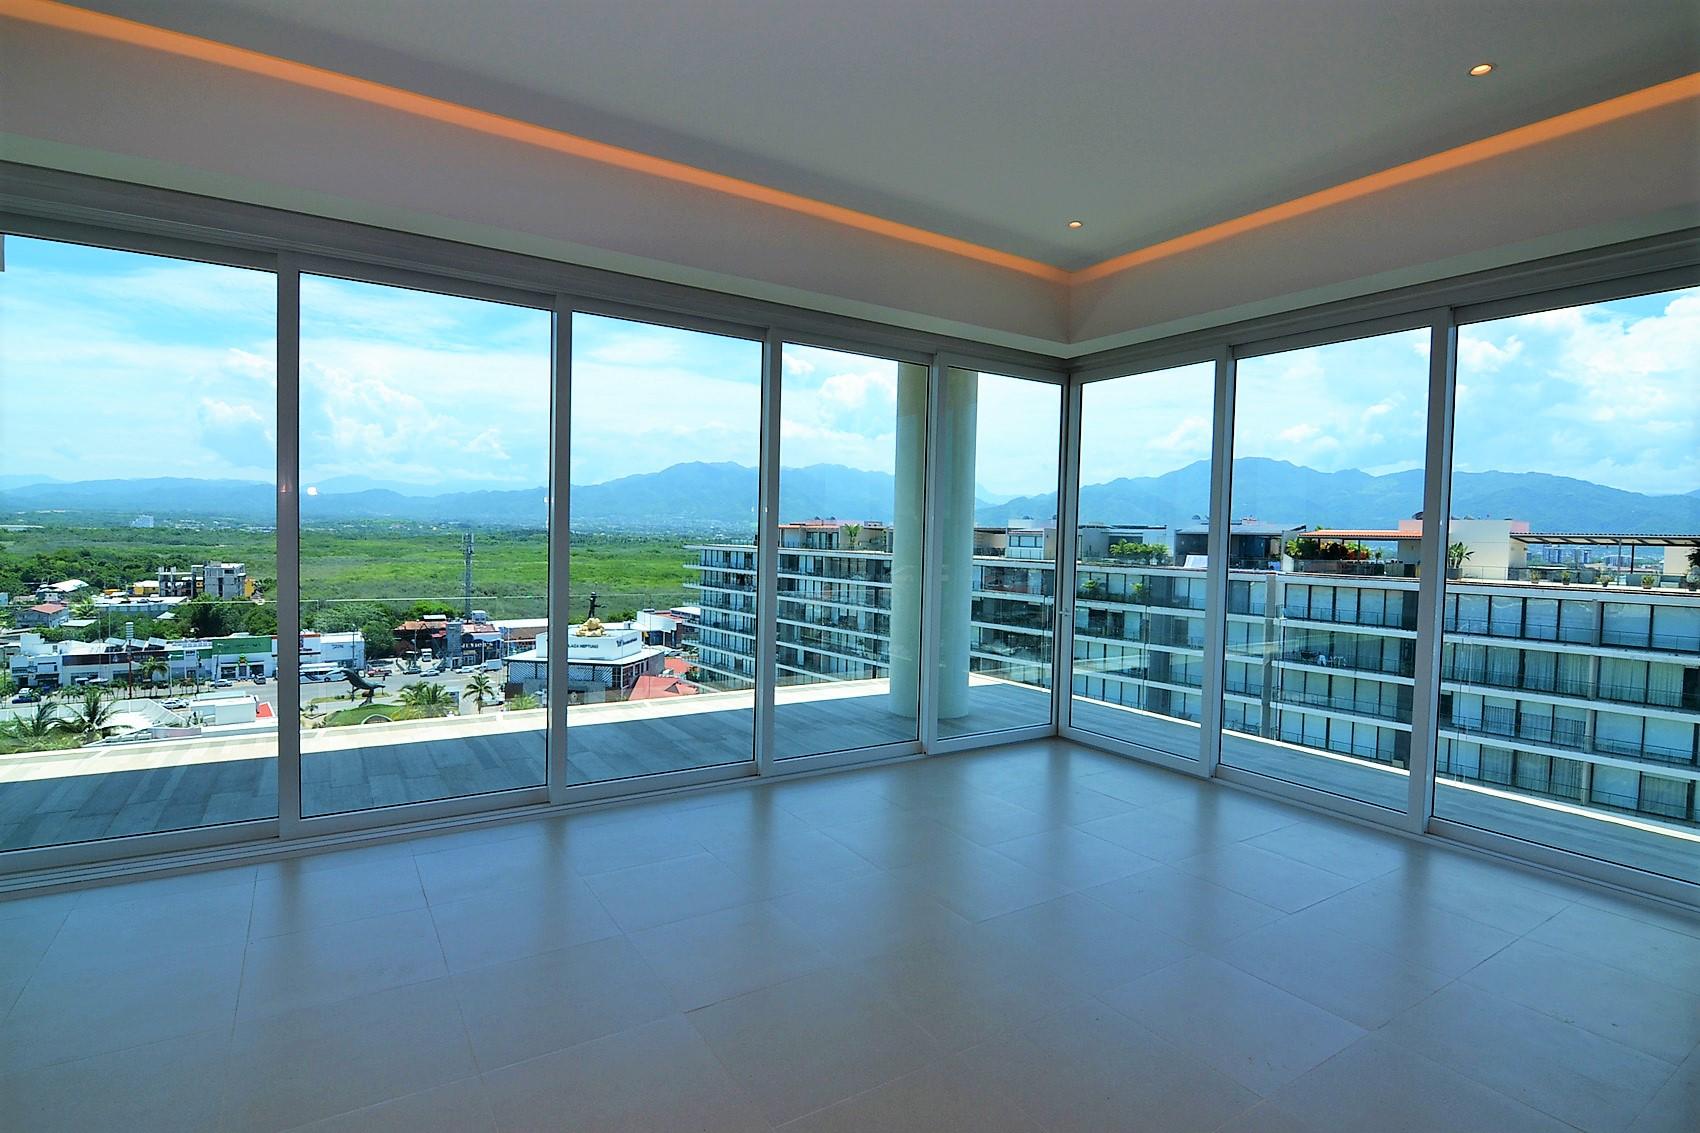 Condo VMarina PH10 - Puerto Vallarta Luxury Condo For Rent (54)